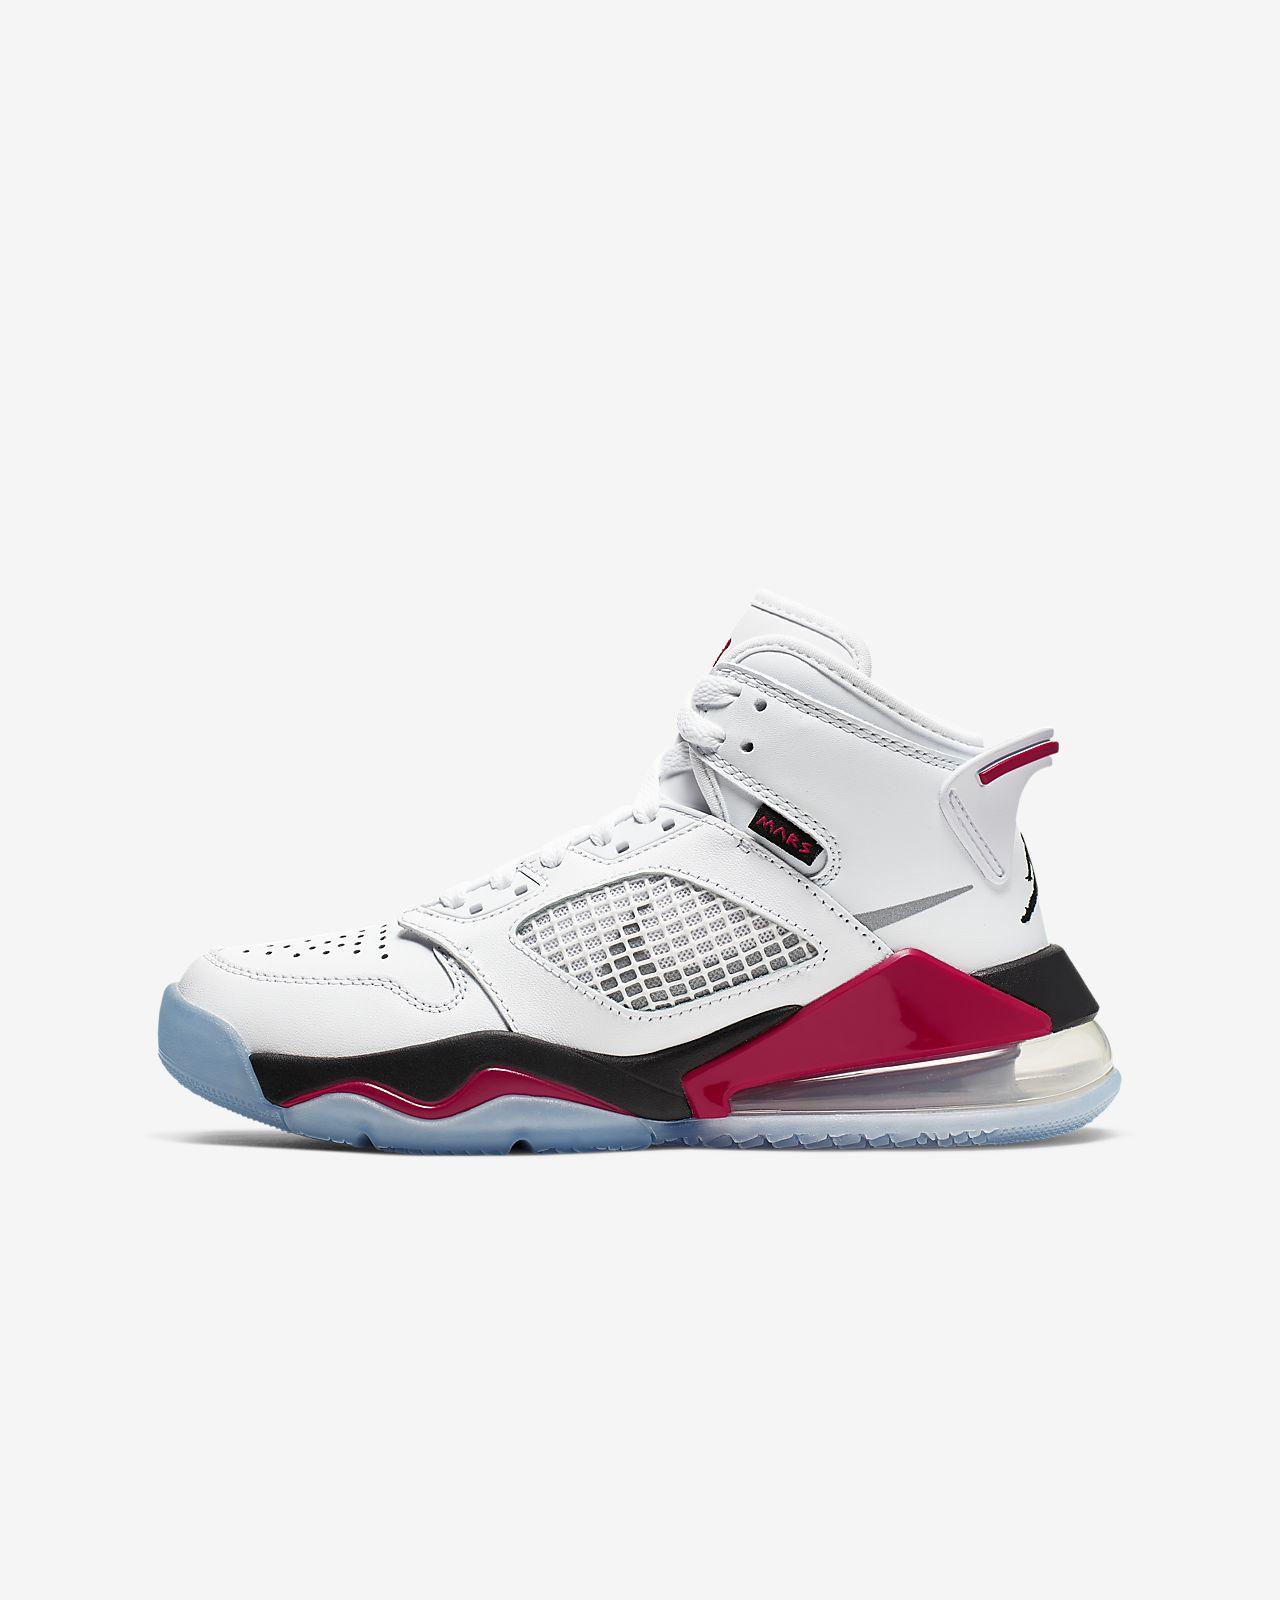 Jordan Mars 270 Big Kids' Shoe